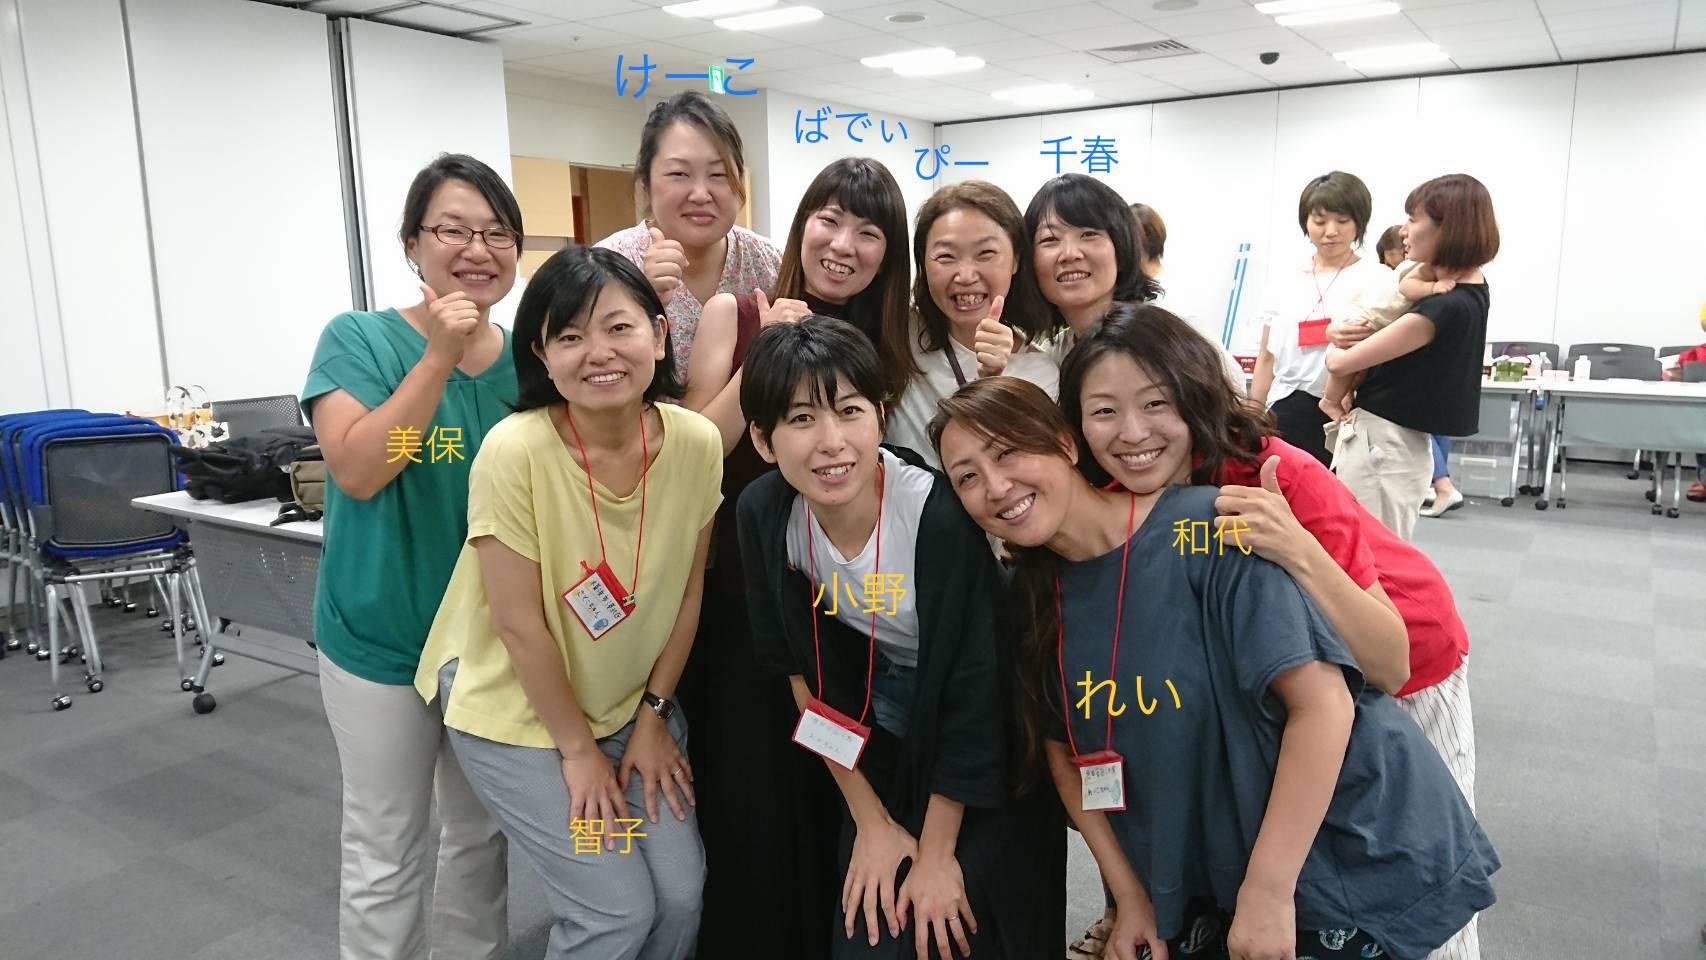 2018/7/24   1010HAPPY藤沢Fグループ感想①魂に響いたお話②感想